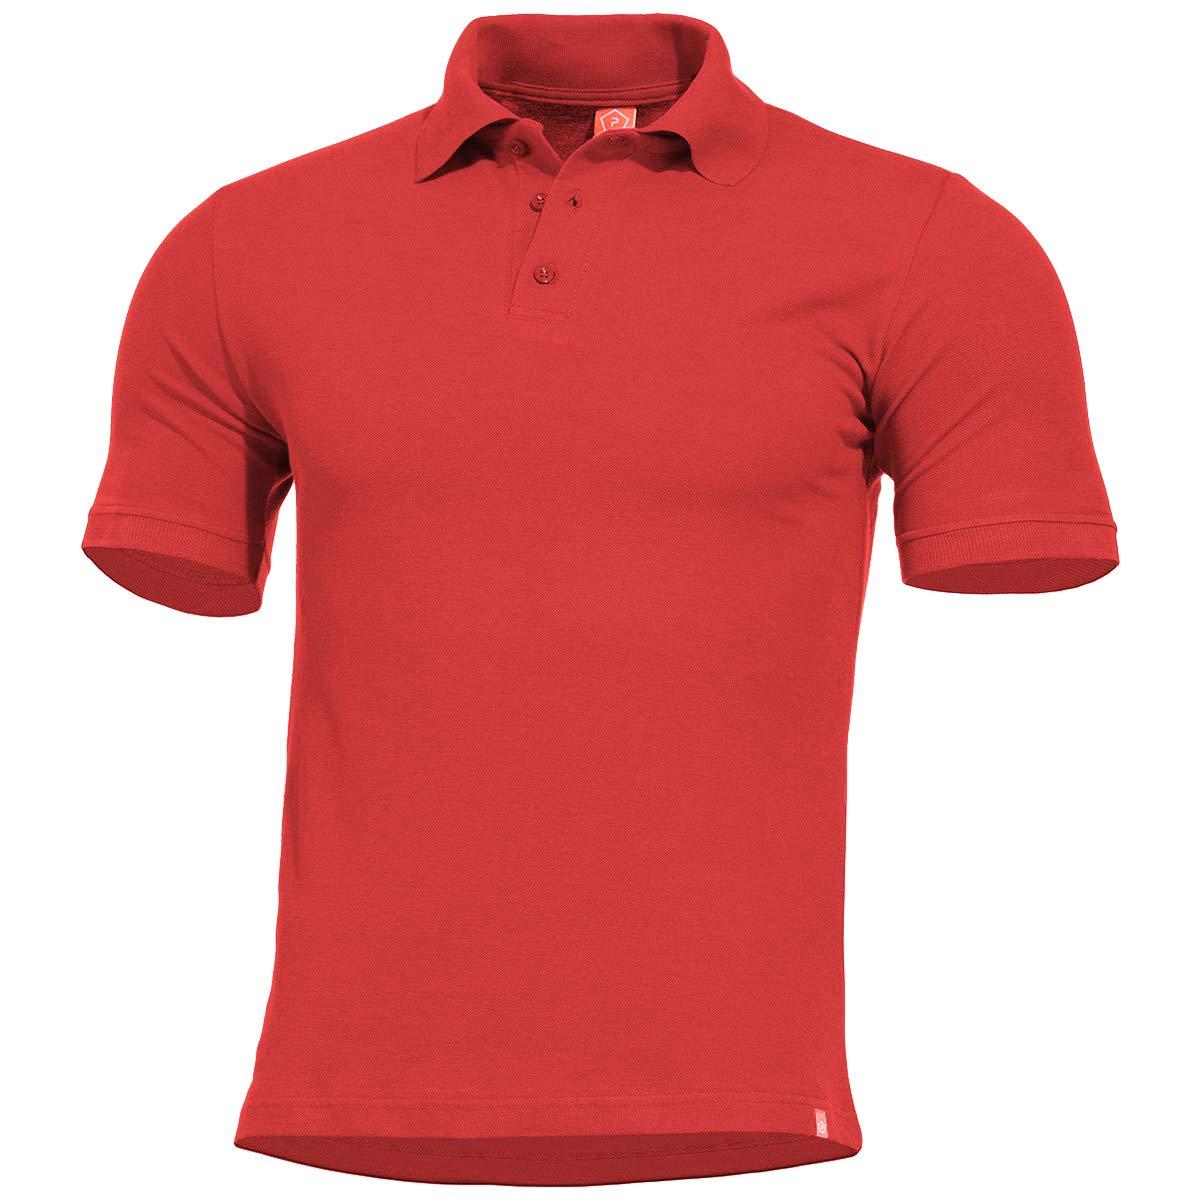 Pentagon Hombres Sierra Polo Camiseta Rojo tamaño M: Amazon.es ...